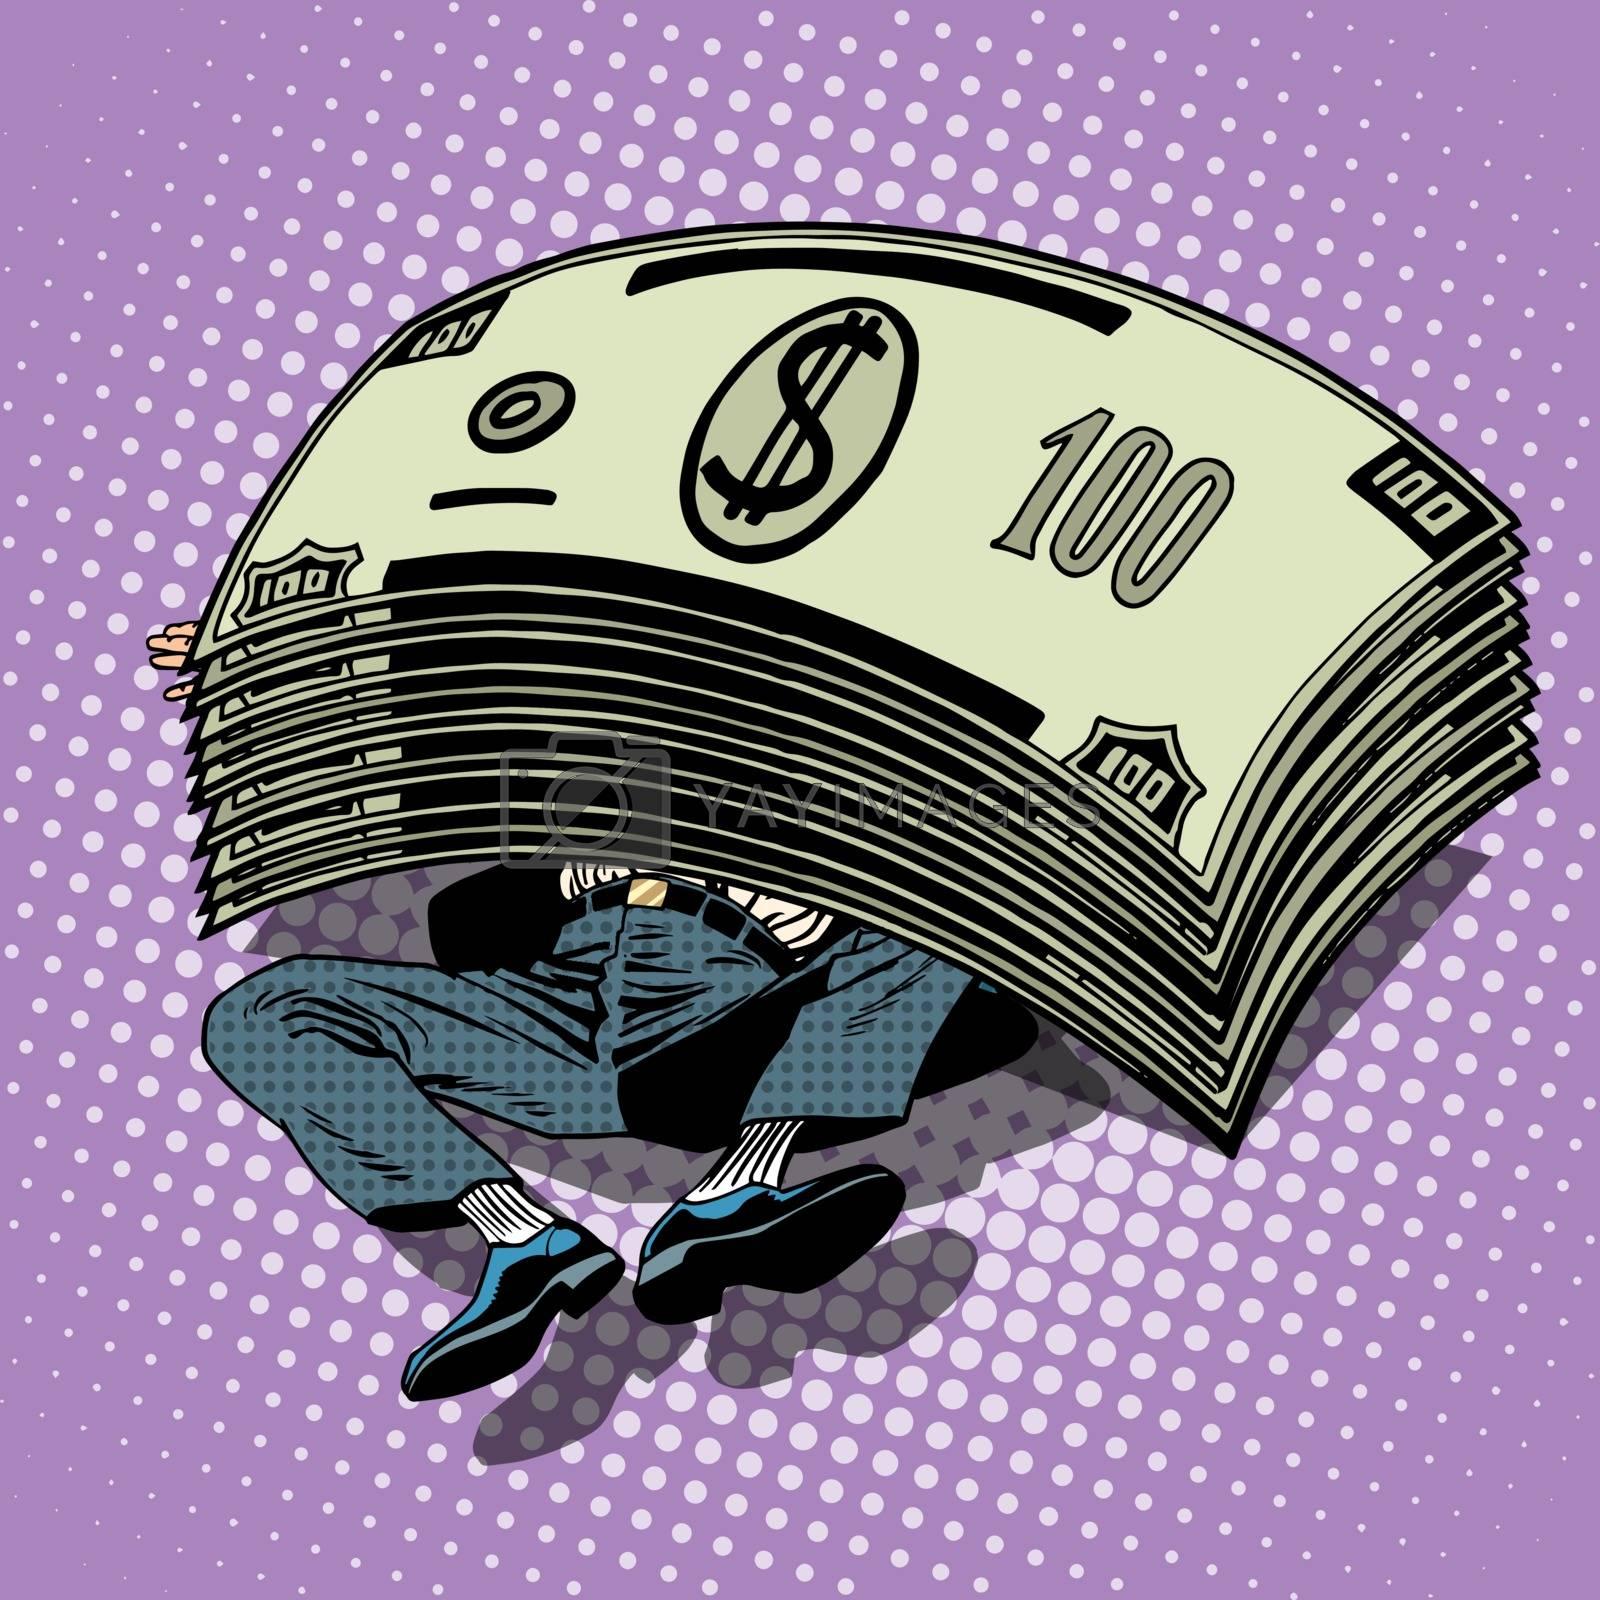 Businessman buried money wealth financial success pop art retro style. Millionaire under the stack of dollars. Business profits